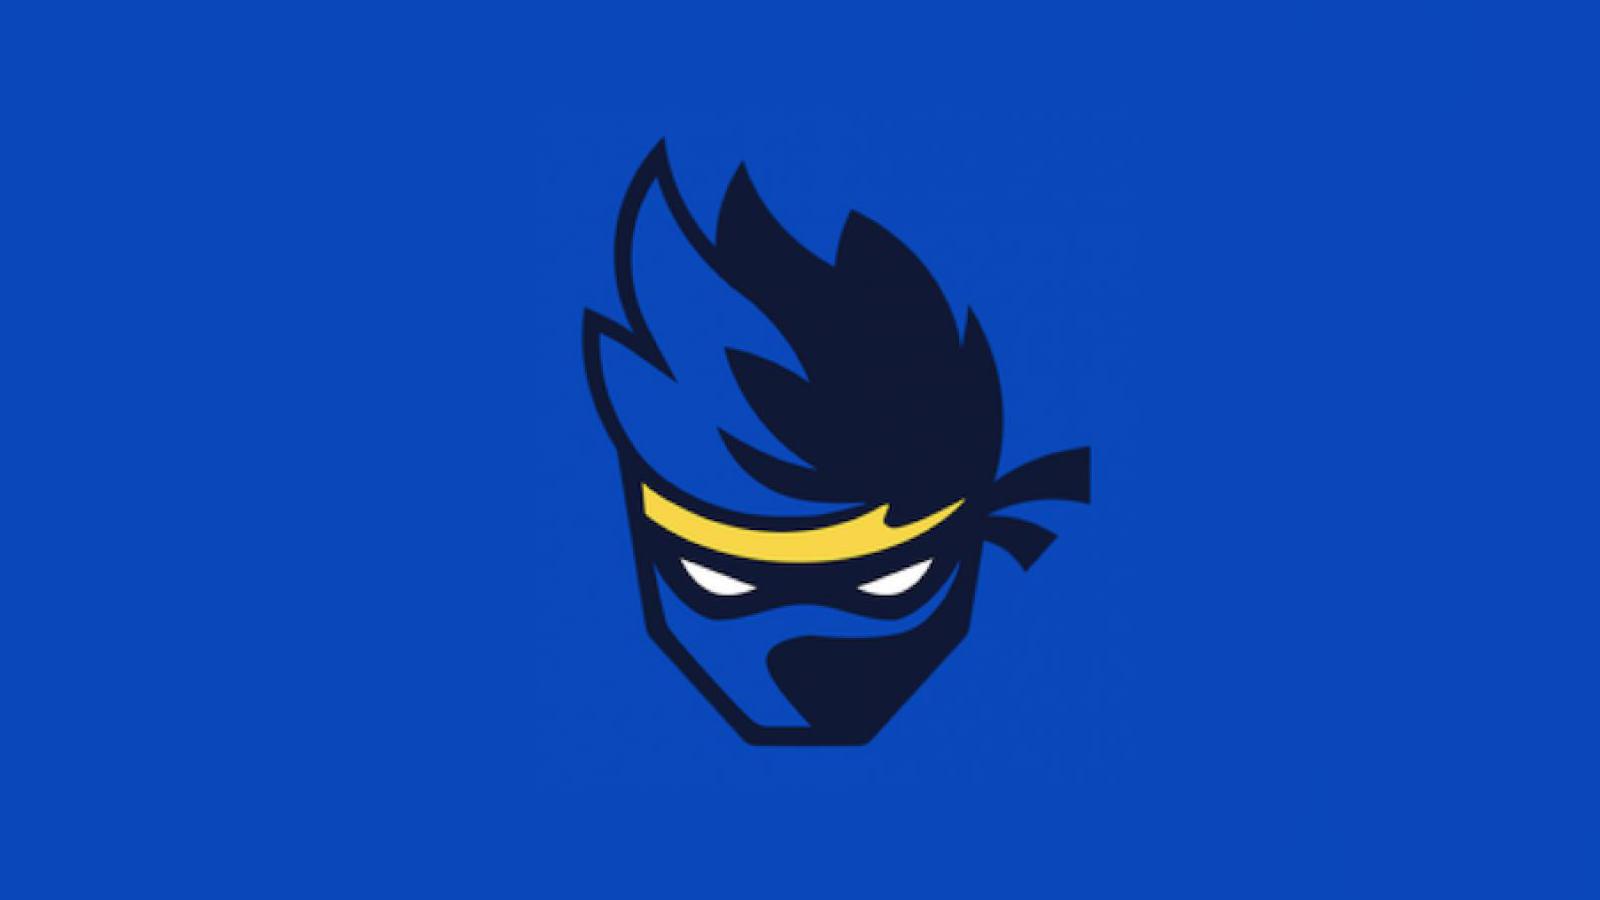 Ninja Gaming Wallpapers   Top Ninja Gaming Backgrounds 1600x900